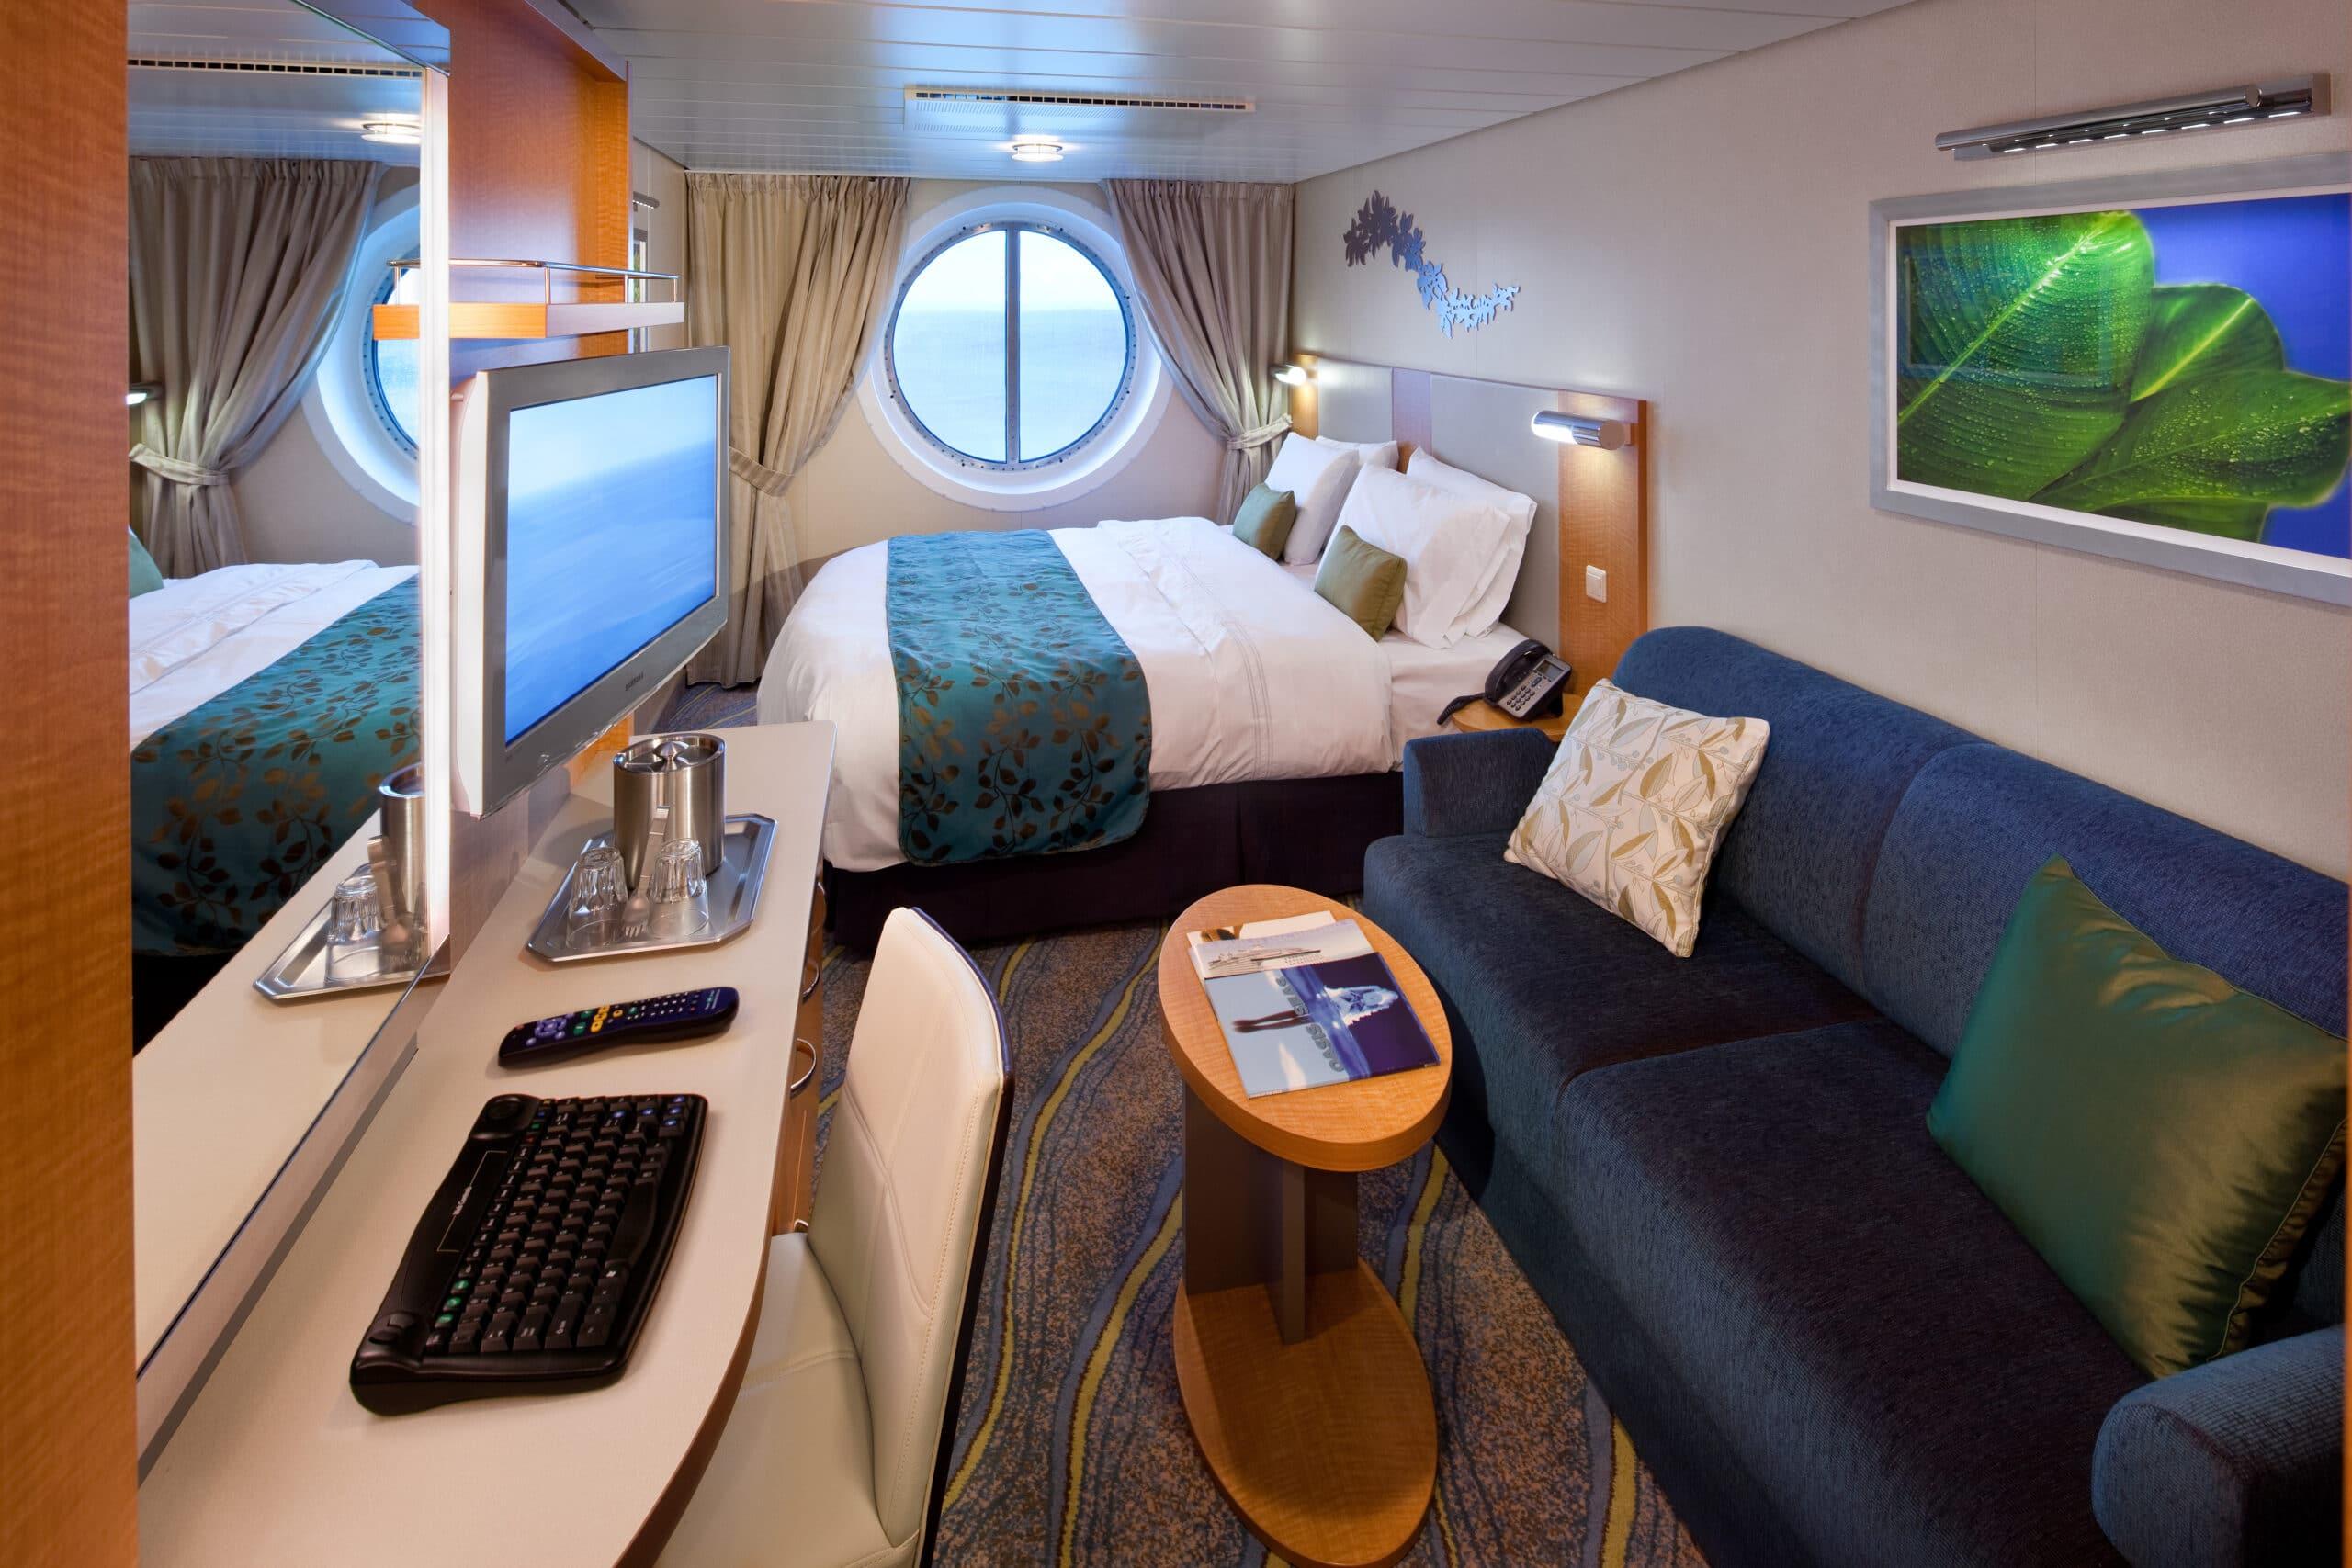 Royal-Caribbean-International-Allure-of-the-Seas-Oasis-of-the-seas-schip-cruiseschip-categorie-1N-2N-4N-buitenhut